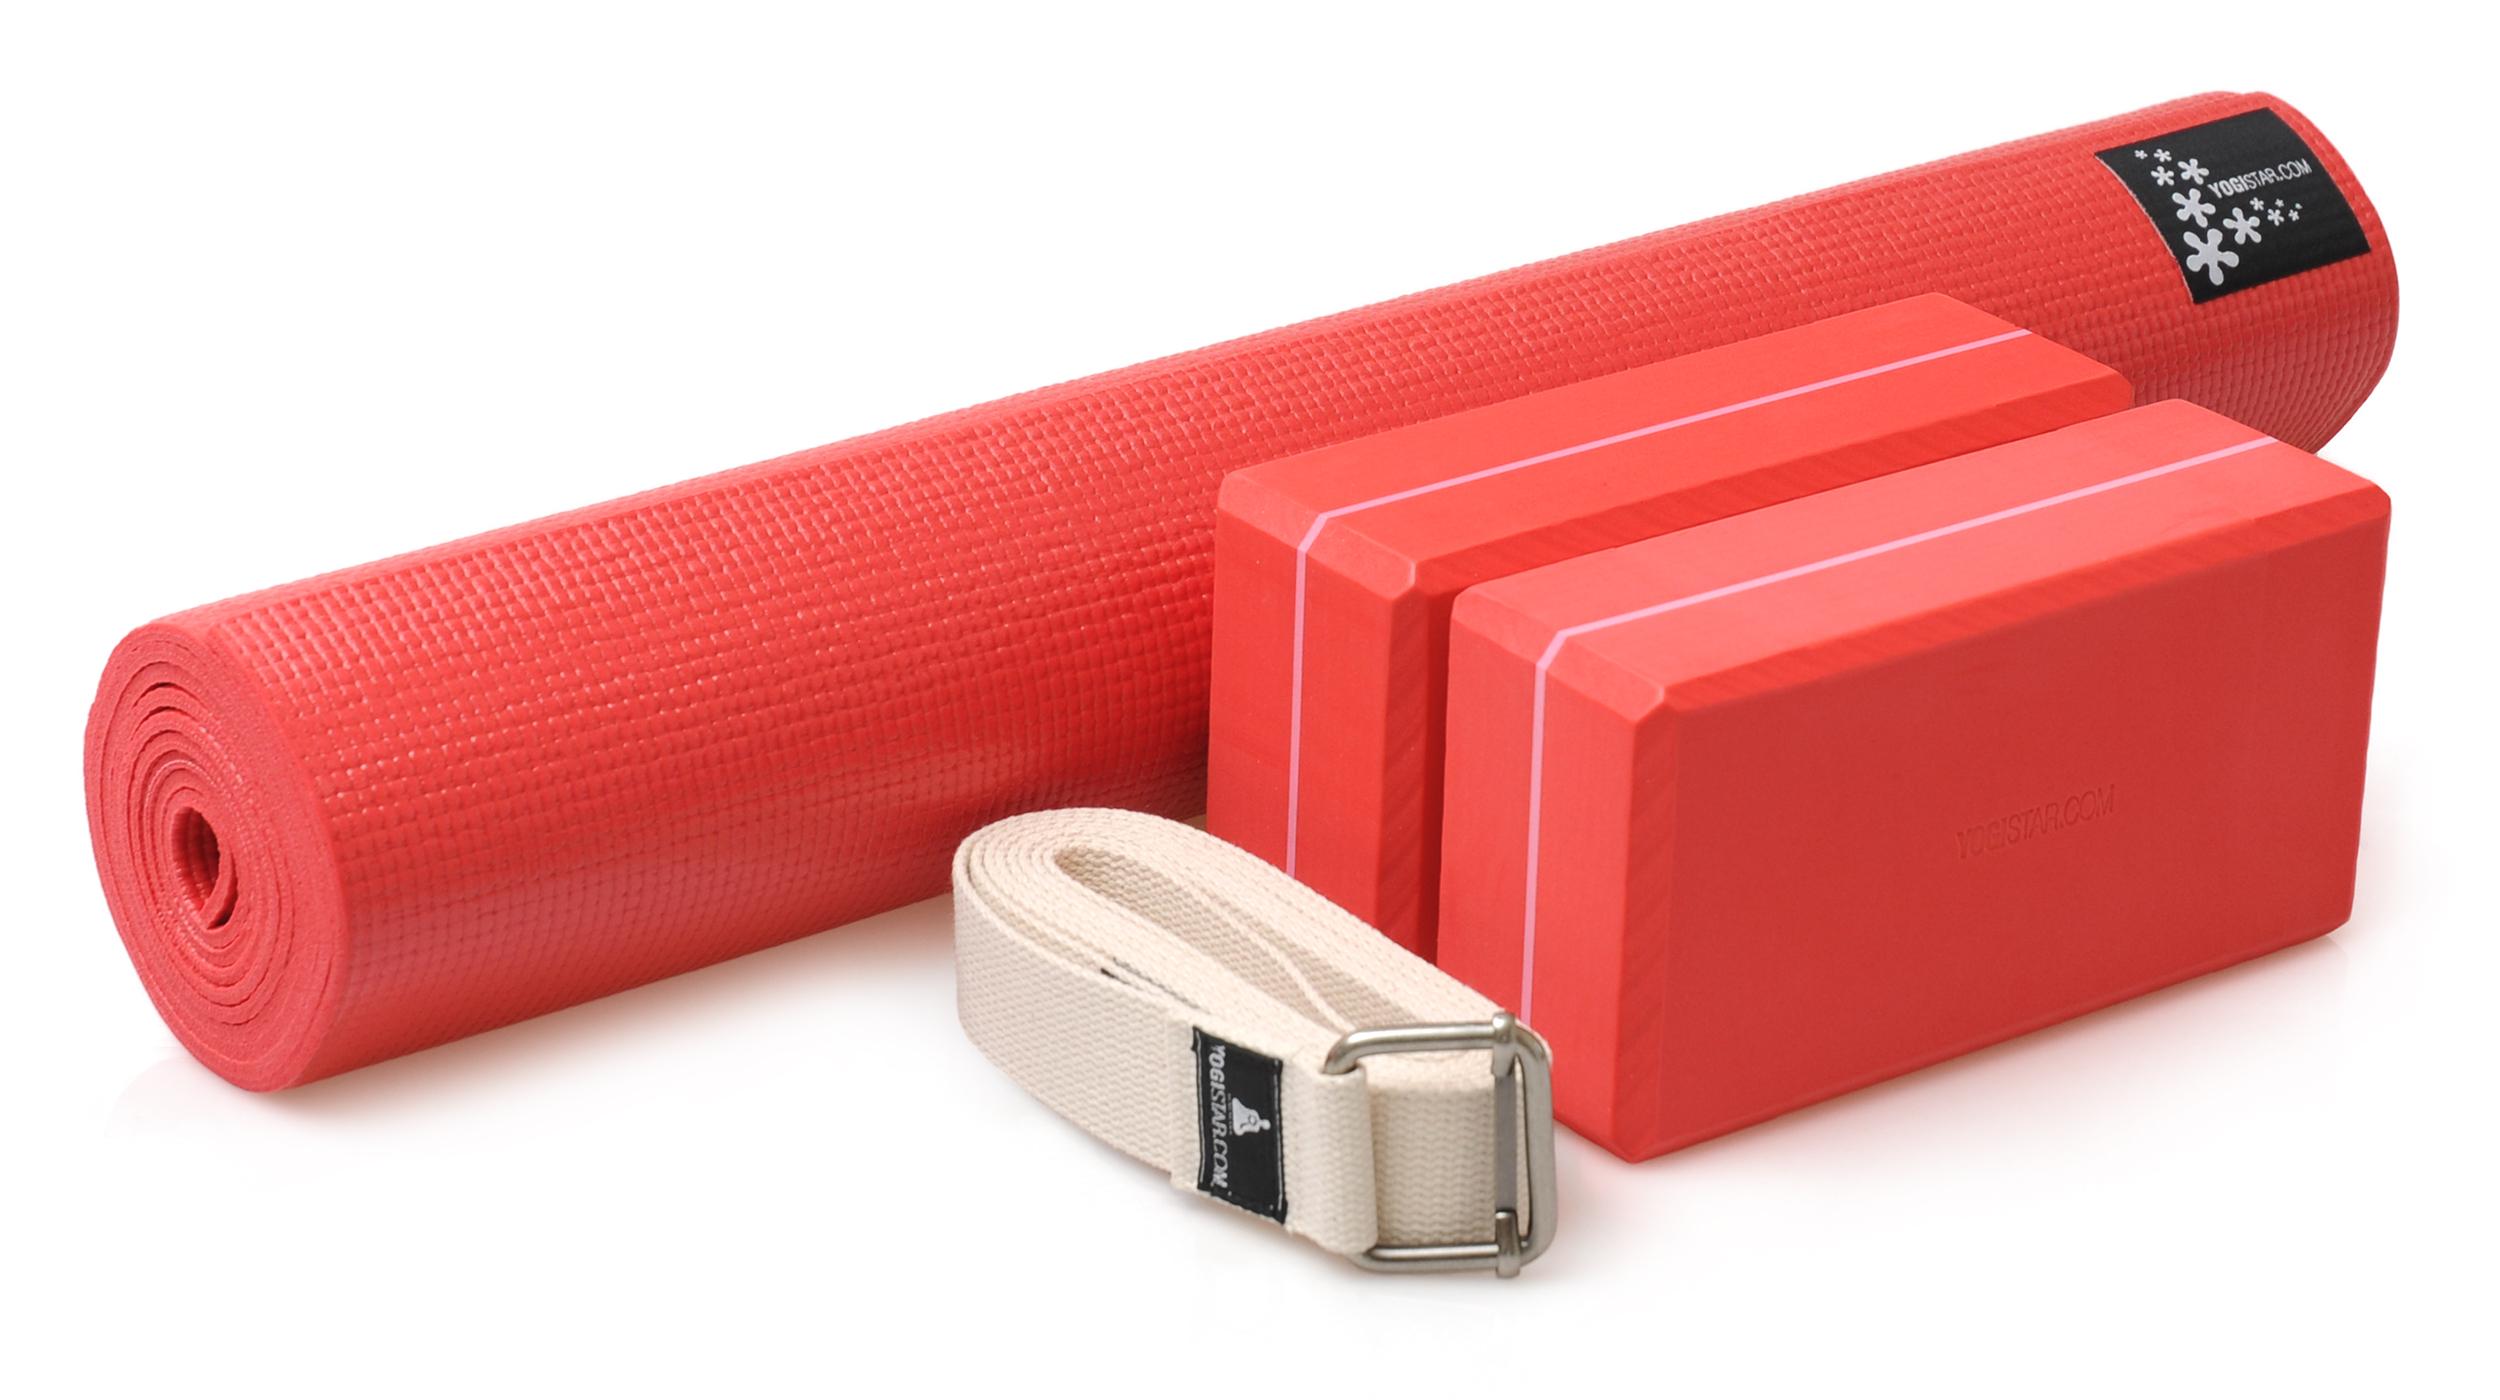 Yoga-Set kick it - two (Yogamatte + 2x Yogablock + Yogagurt)